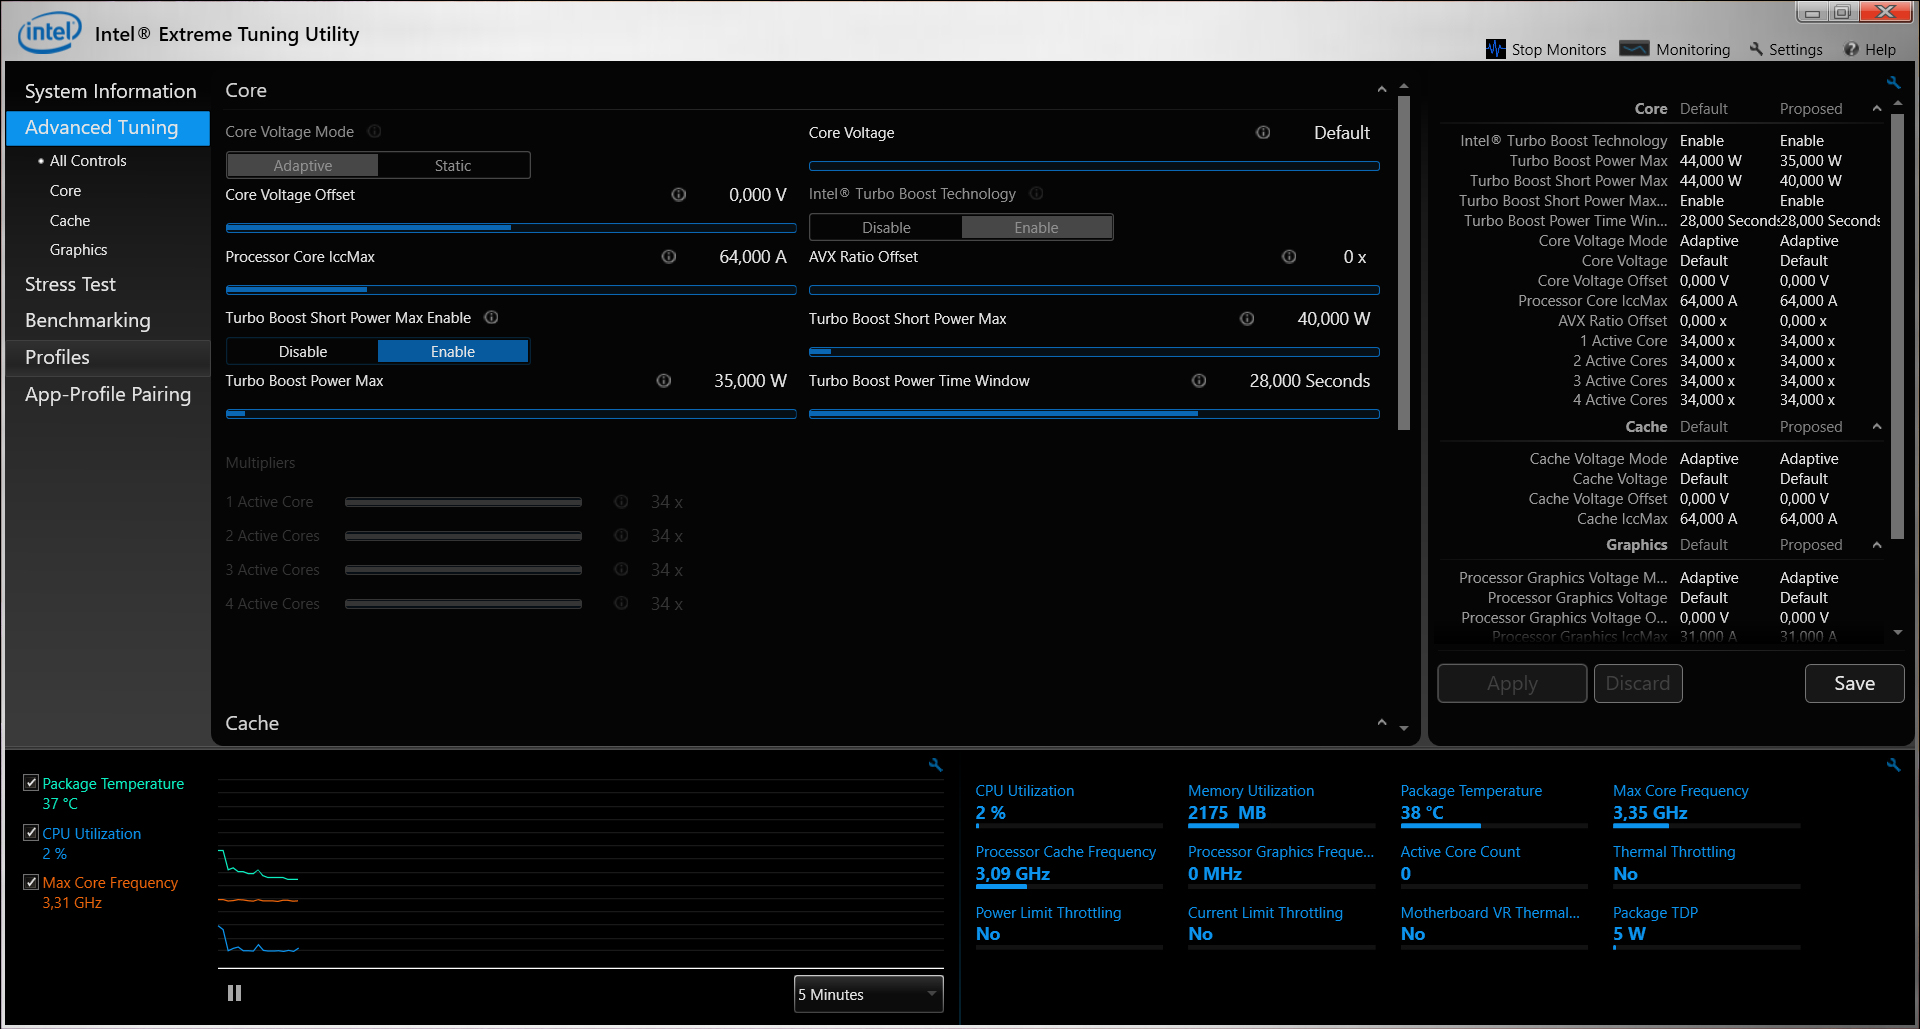 Asus Vivobook 15 X542uf I5 8250u Mx130 Ssd Fhd Laptop Review Cd Writer 8211 How The Burner Works Intel Xtu